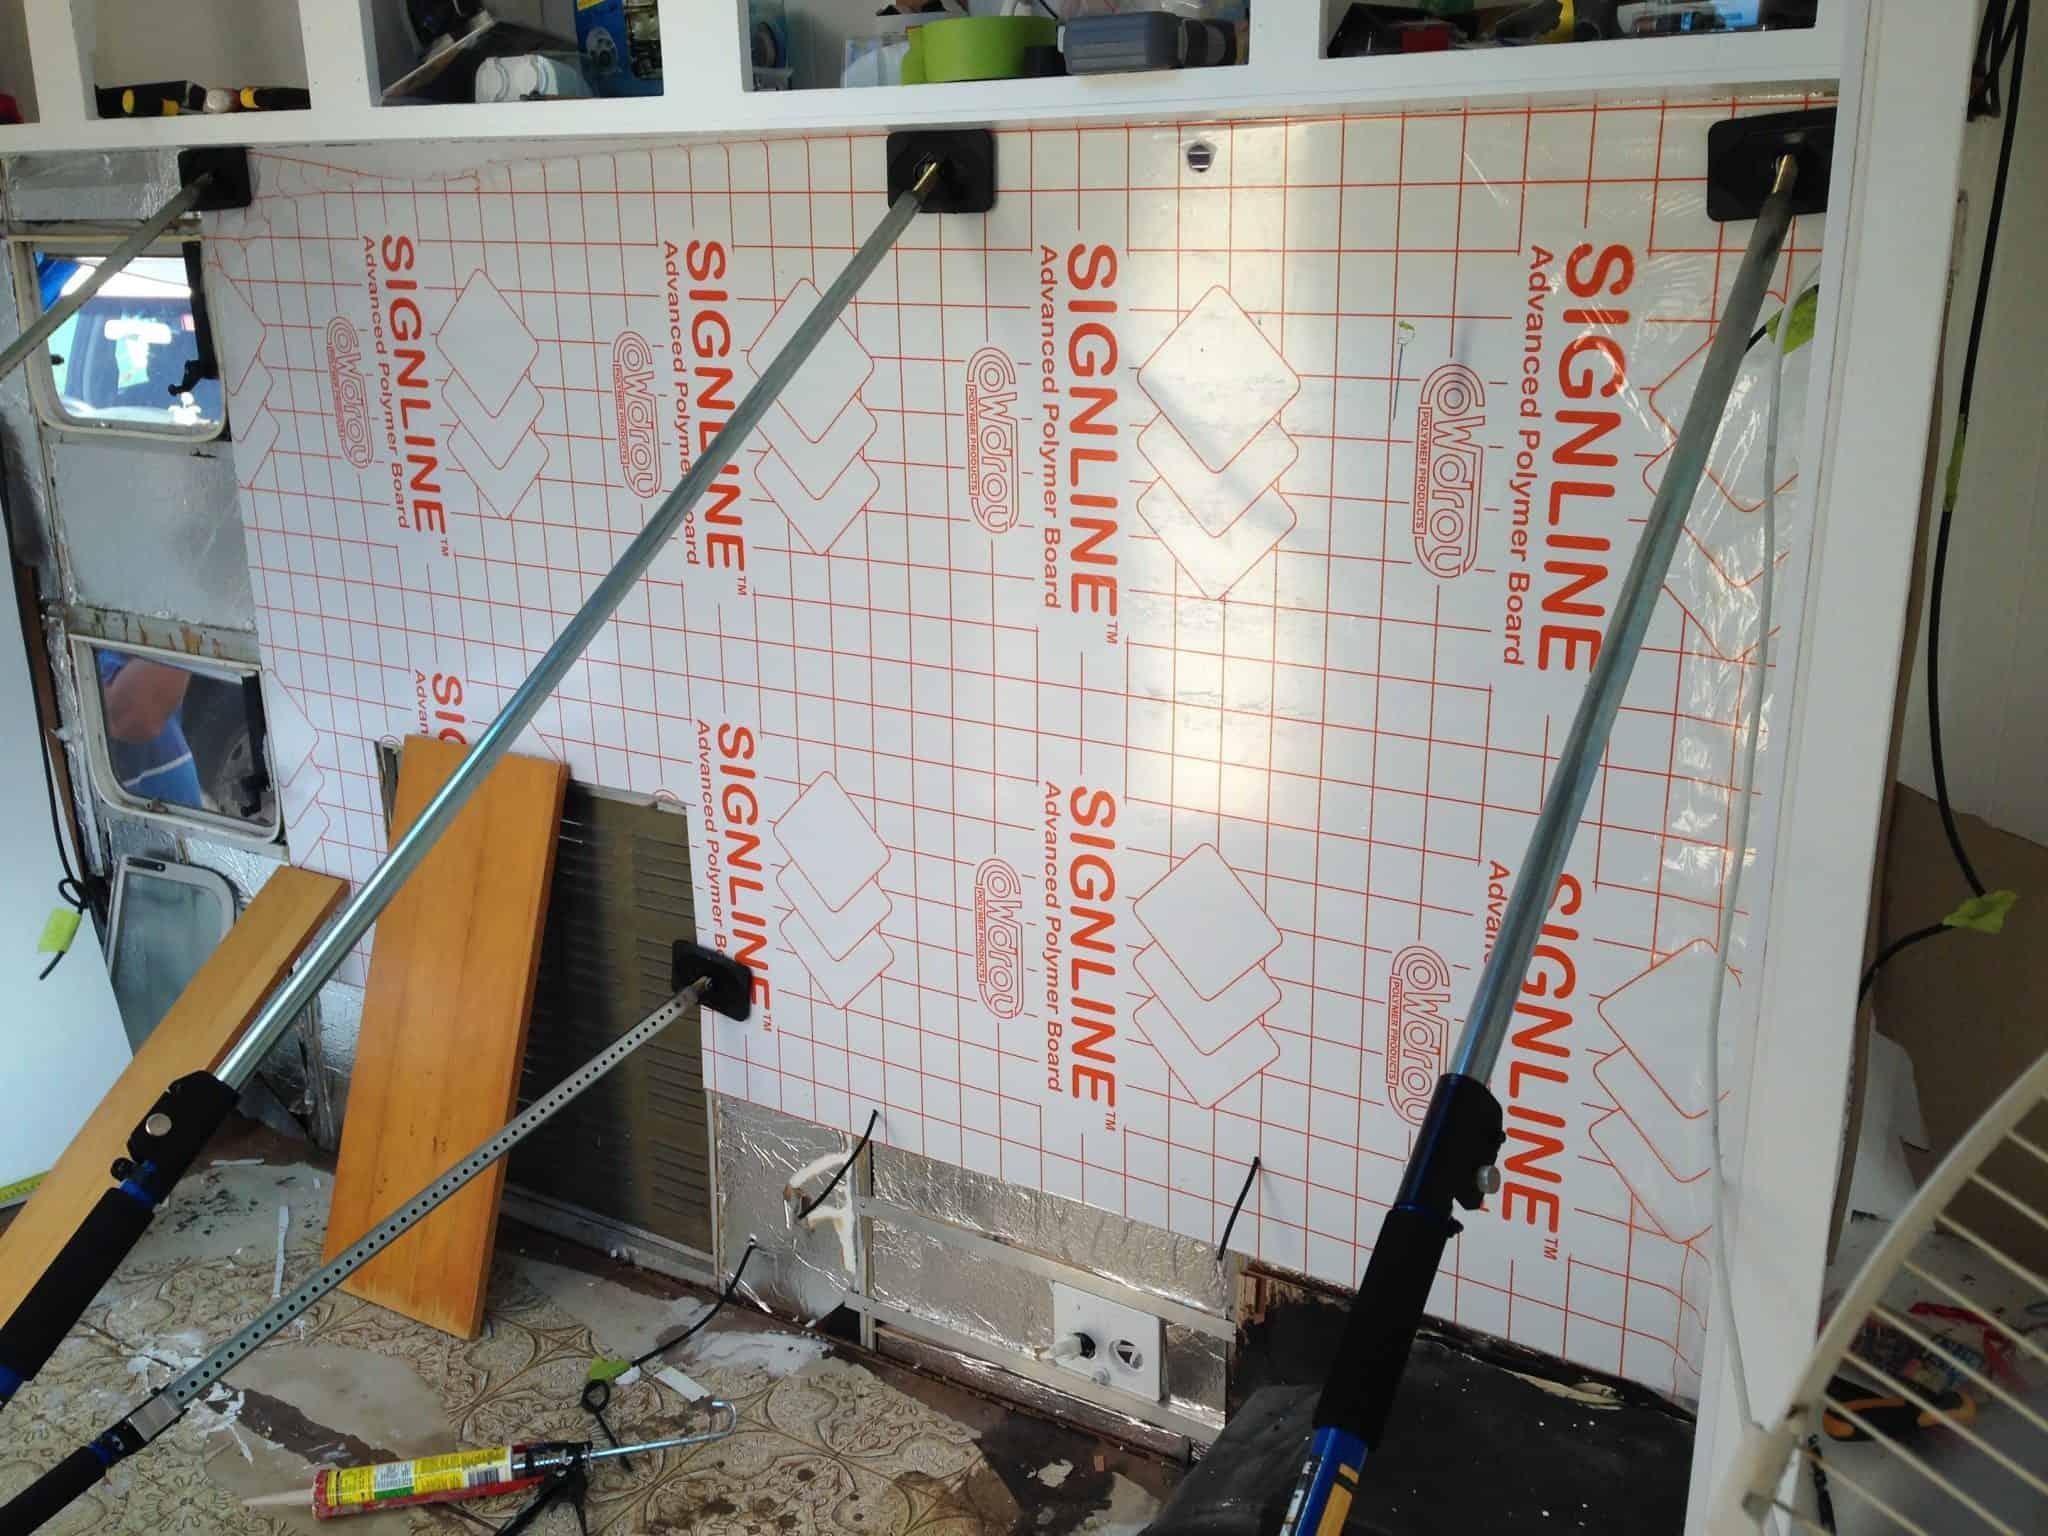 relining caravan walls renovation usoc wiring diagram 05 grand cherokee fuse box,Cat 5 Wiring Diagram Usoc